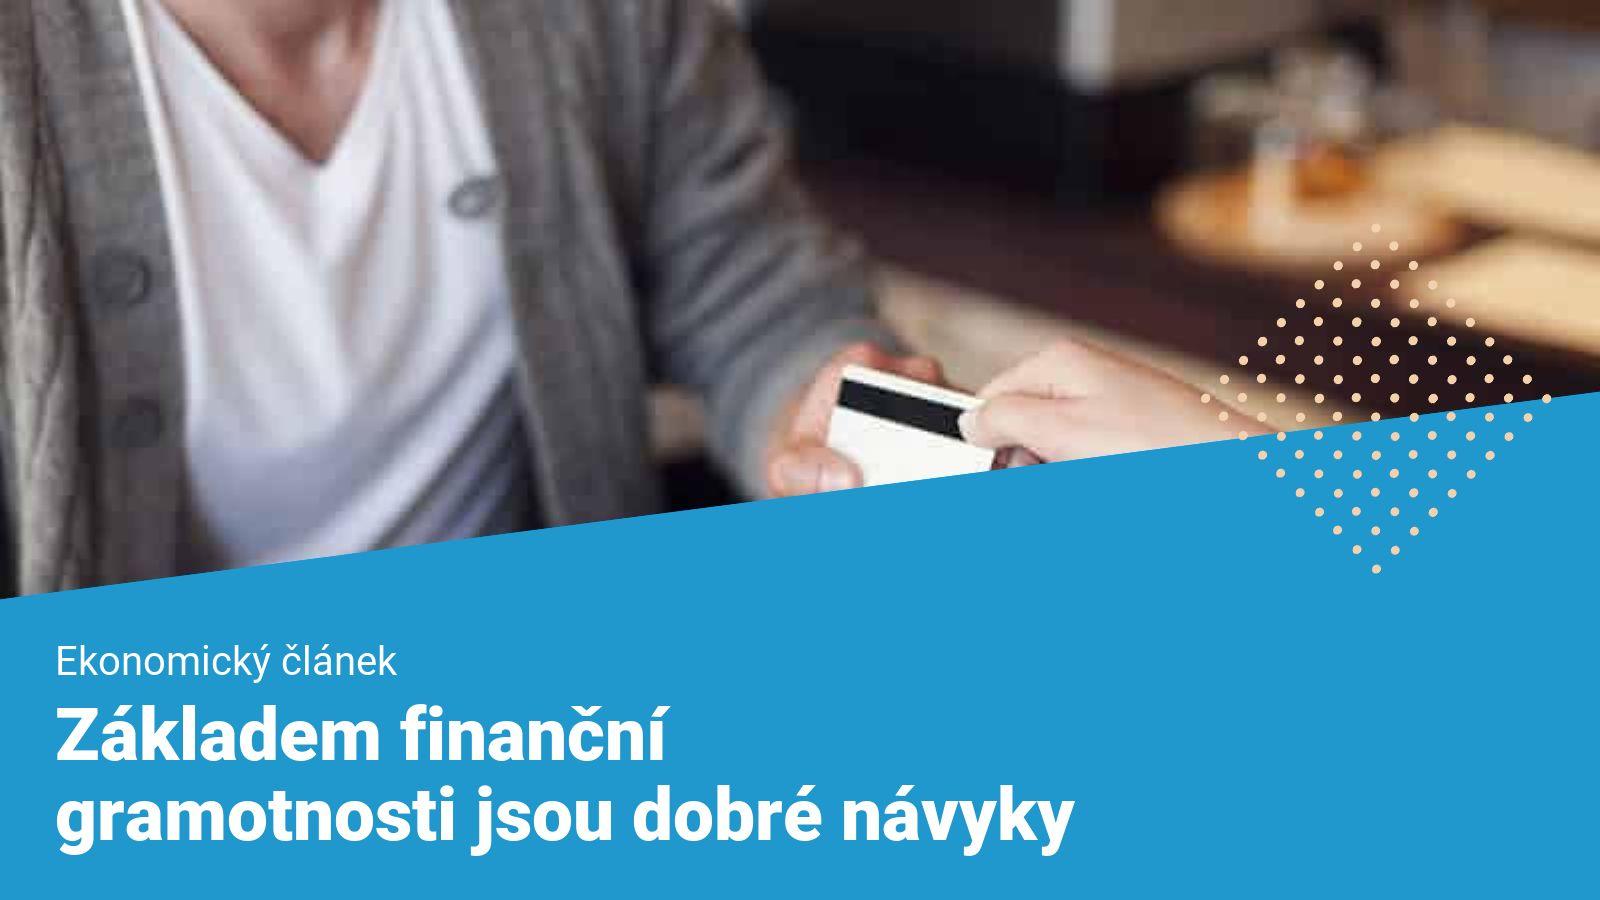 financni-gramotnost-a-navyky